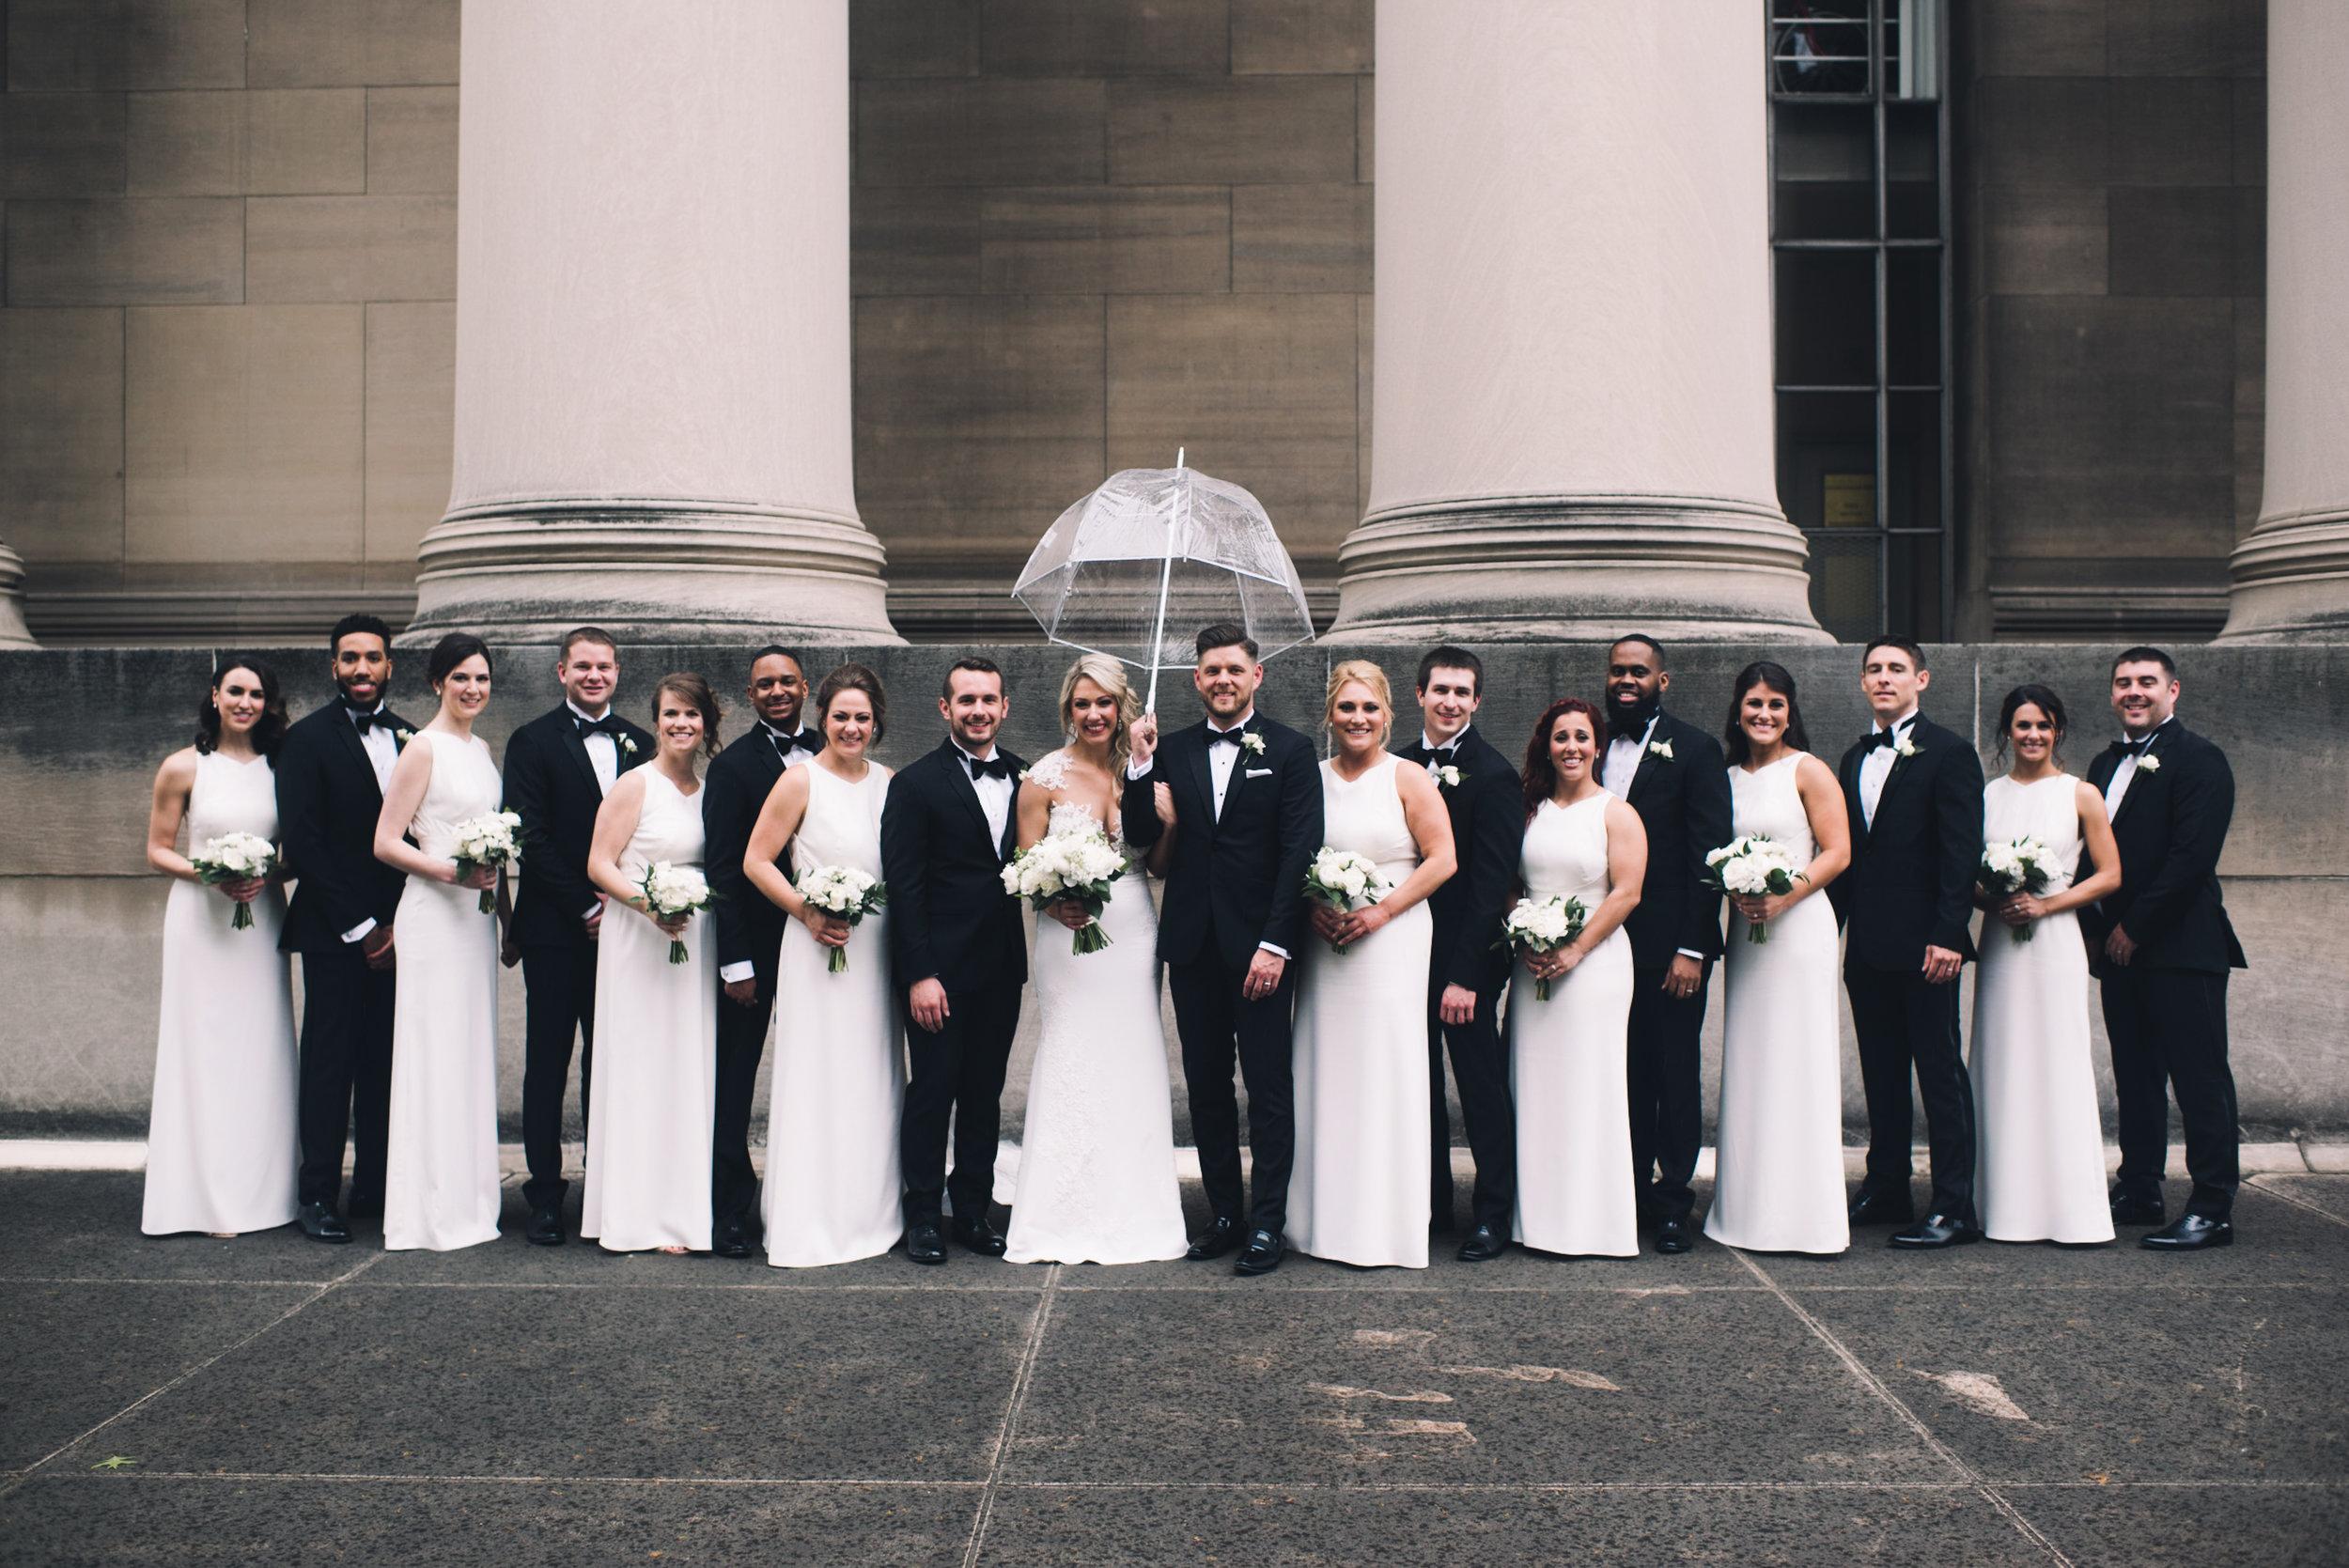 Pittsburgh Pennsylvania New York NYC Wedding Photographer Photojournalist Luxury Downtown Opera - Stirpe 822.jpg